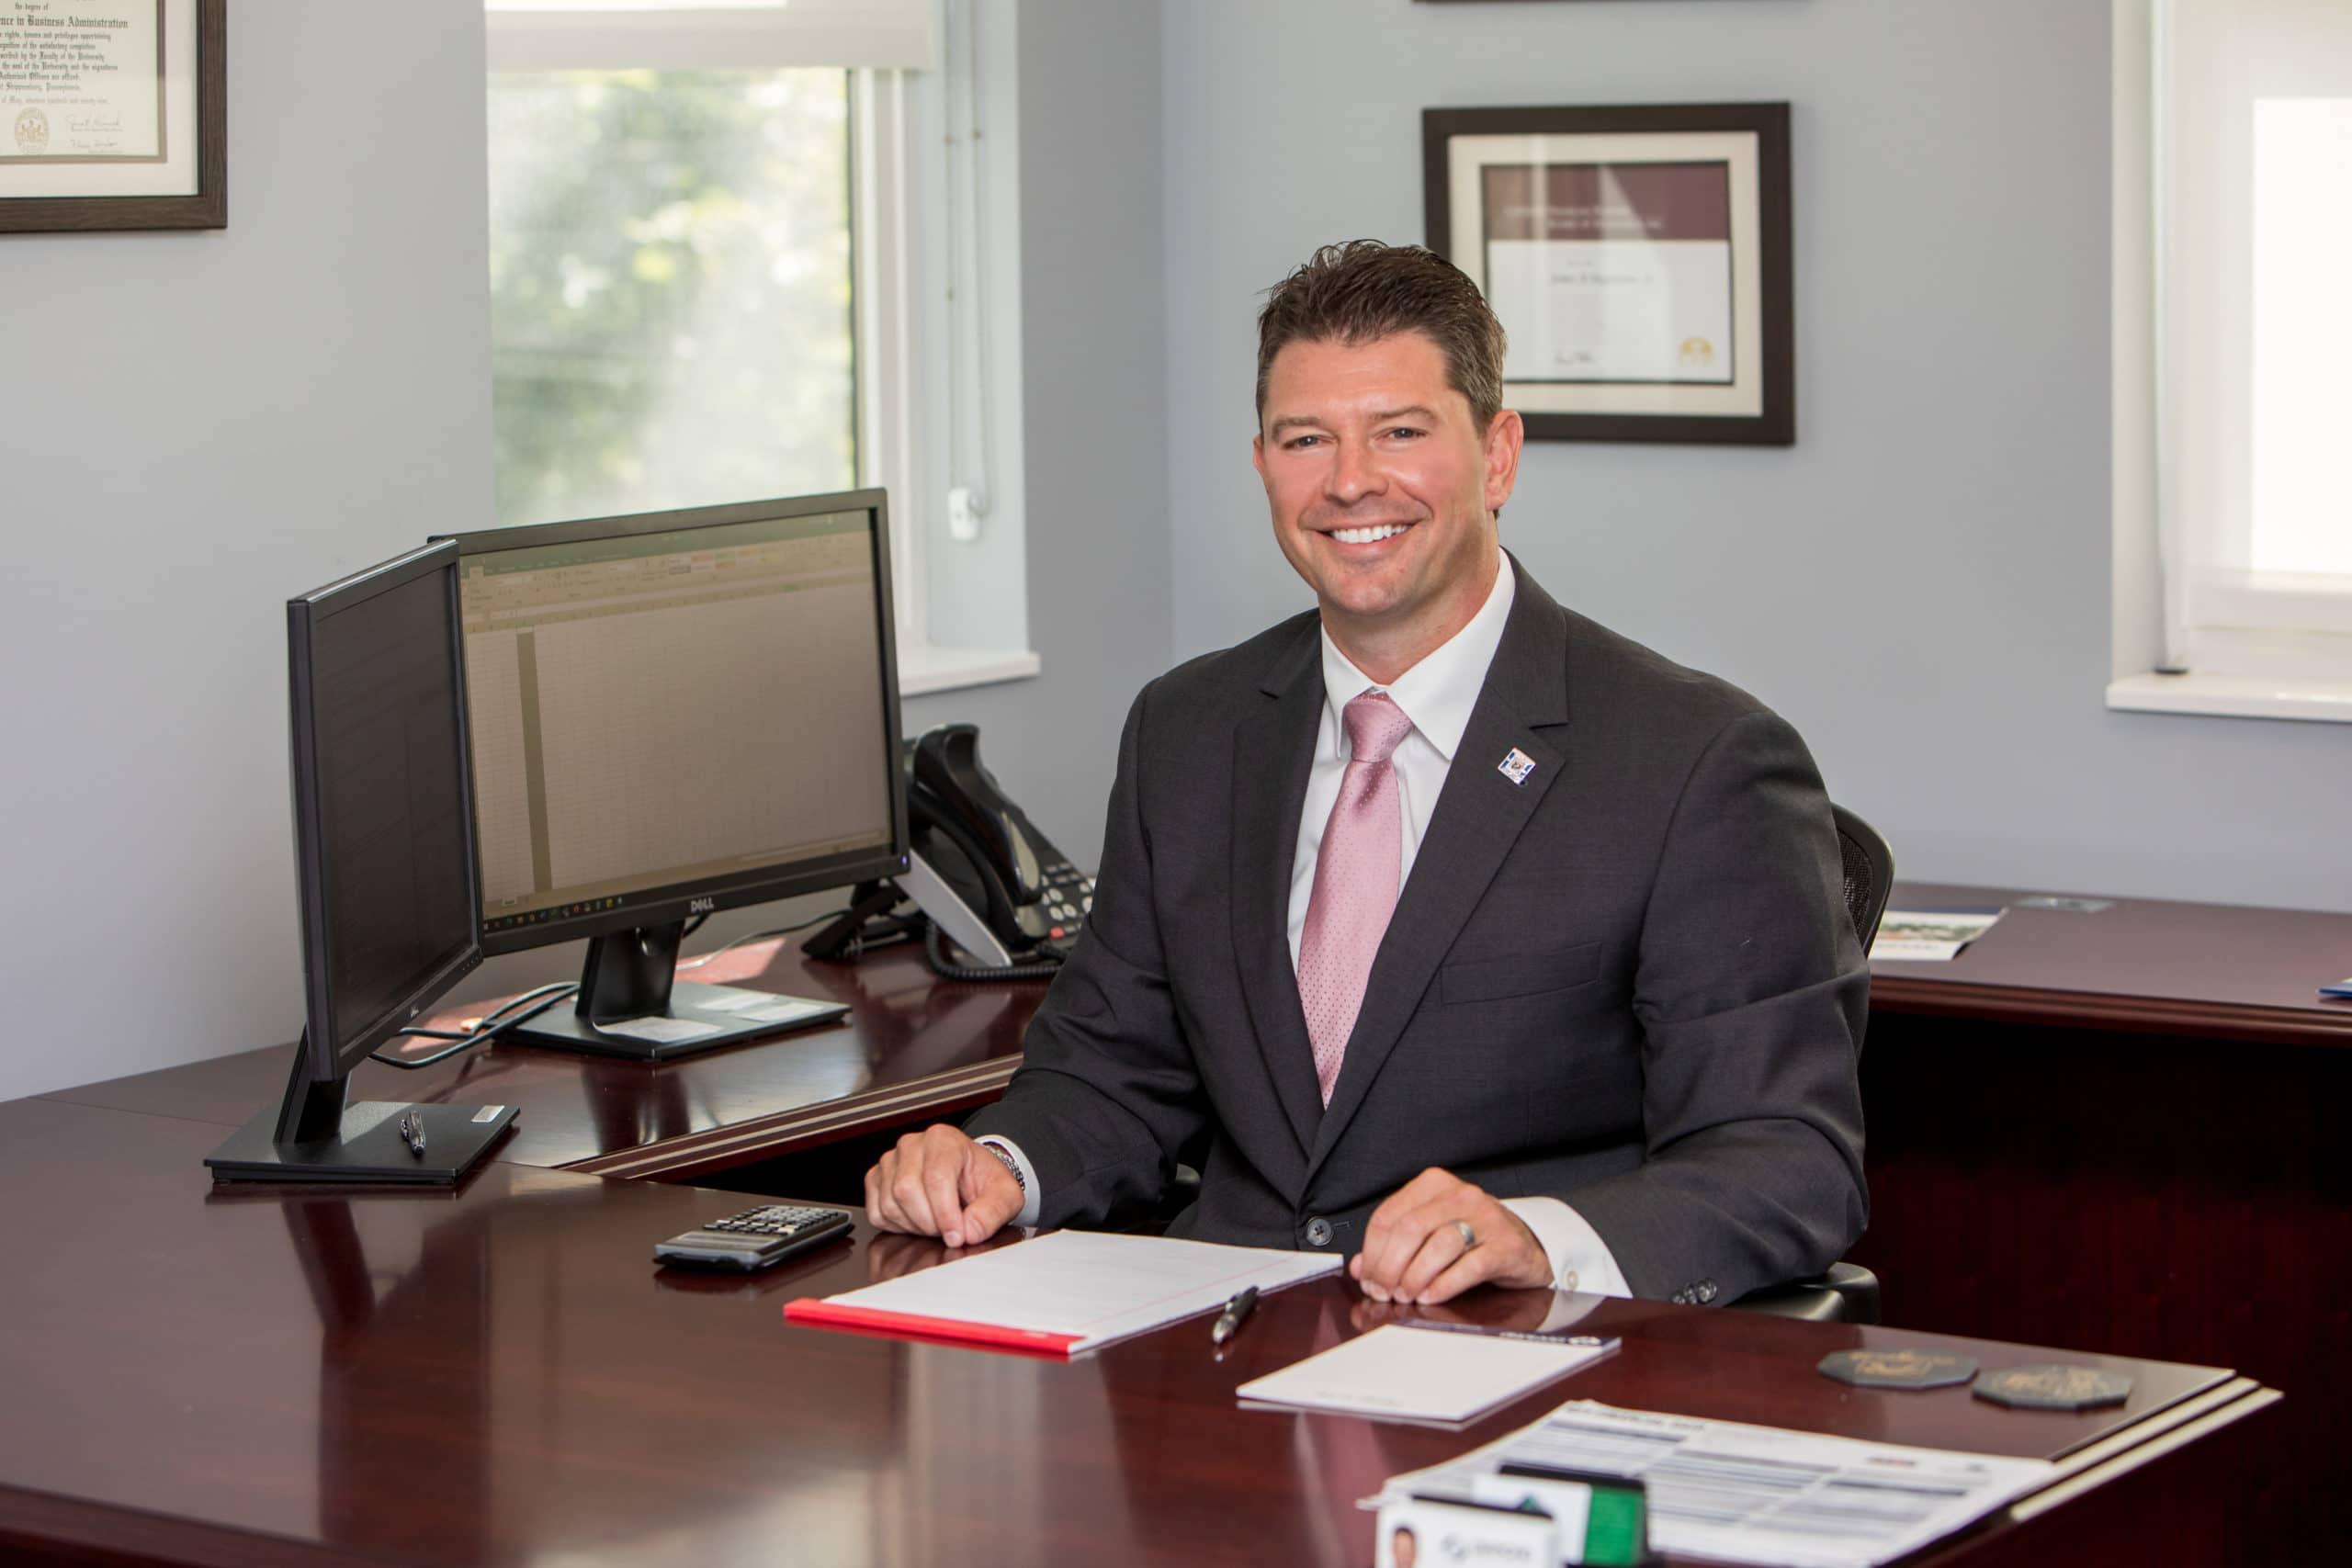 Jim DeGaetano, Financial Planner and Author